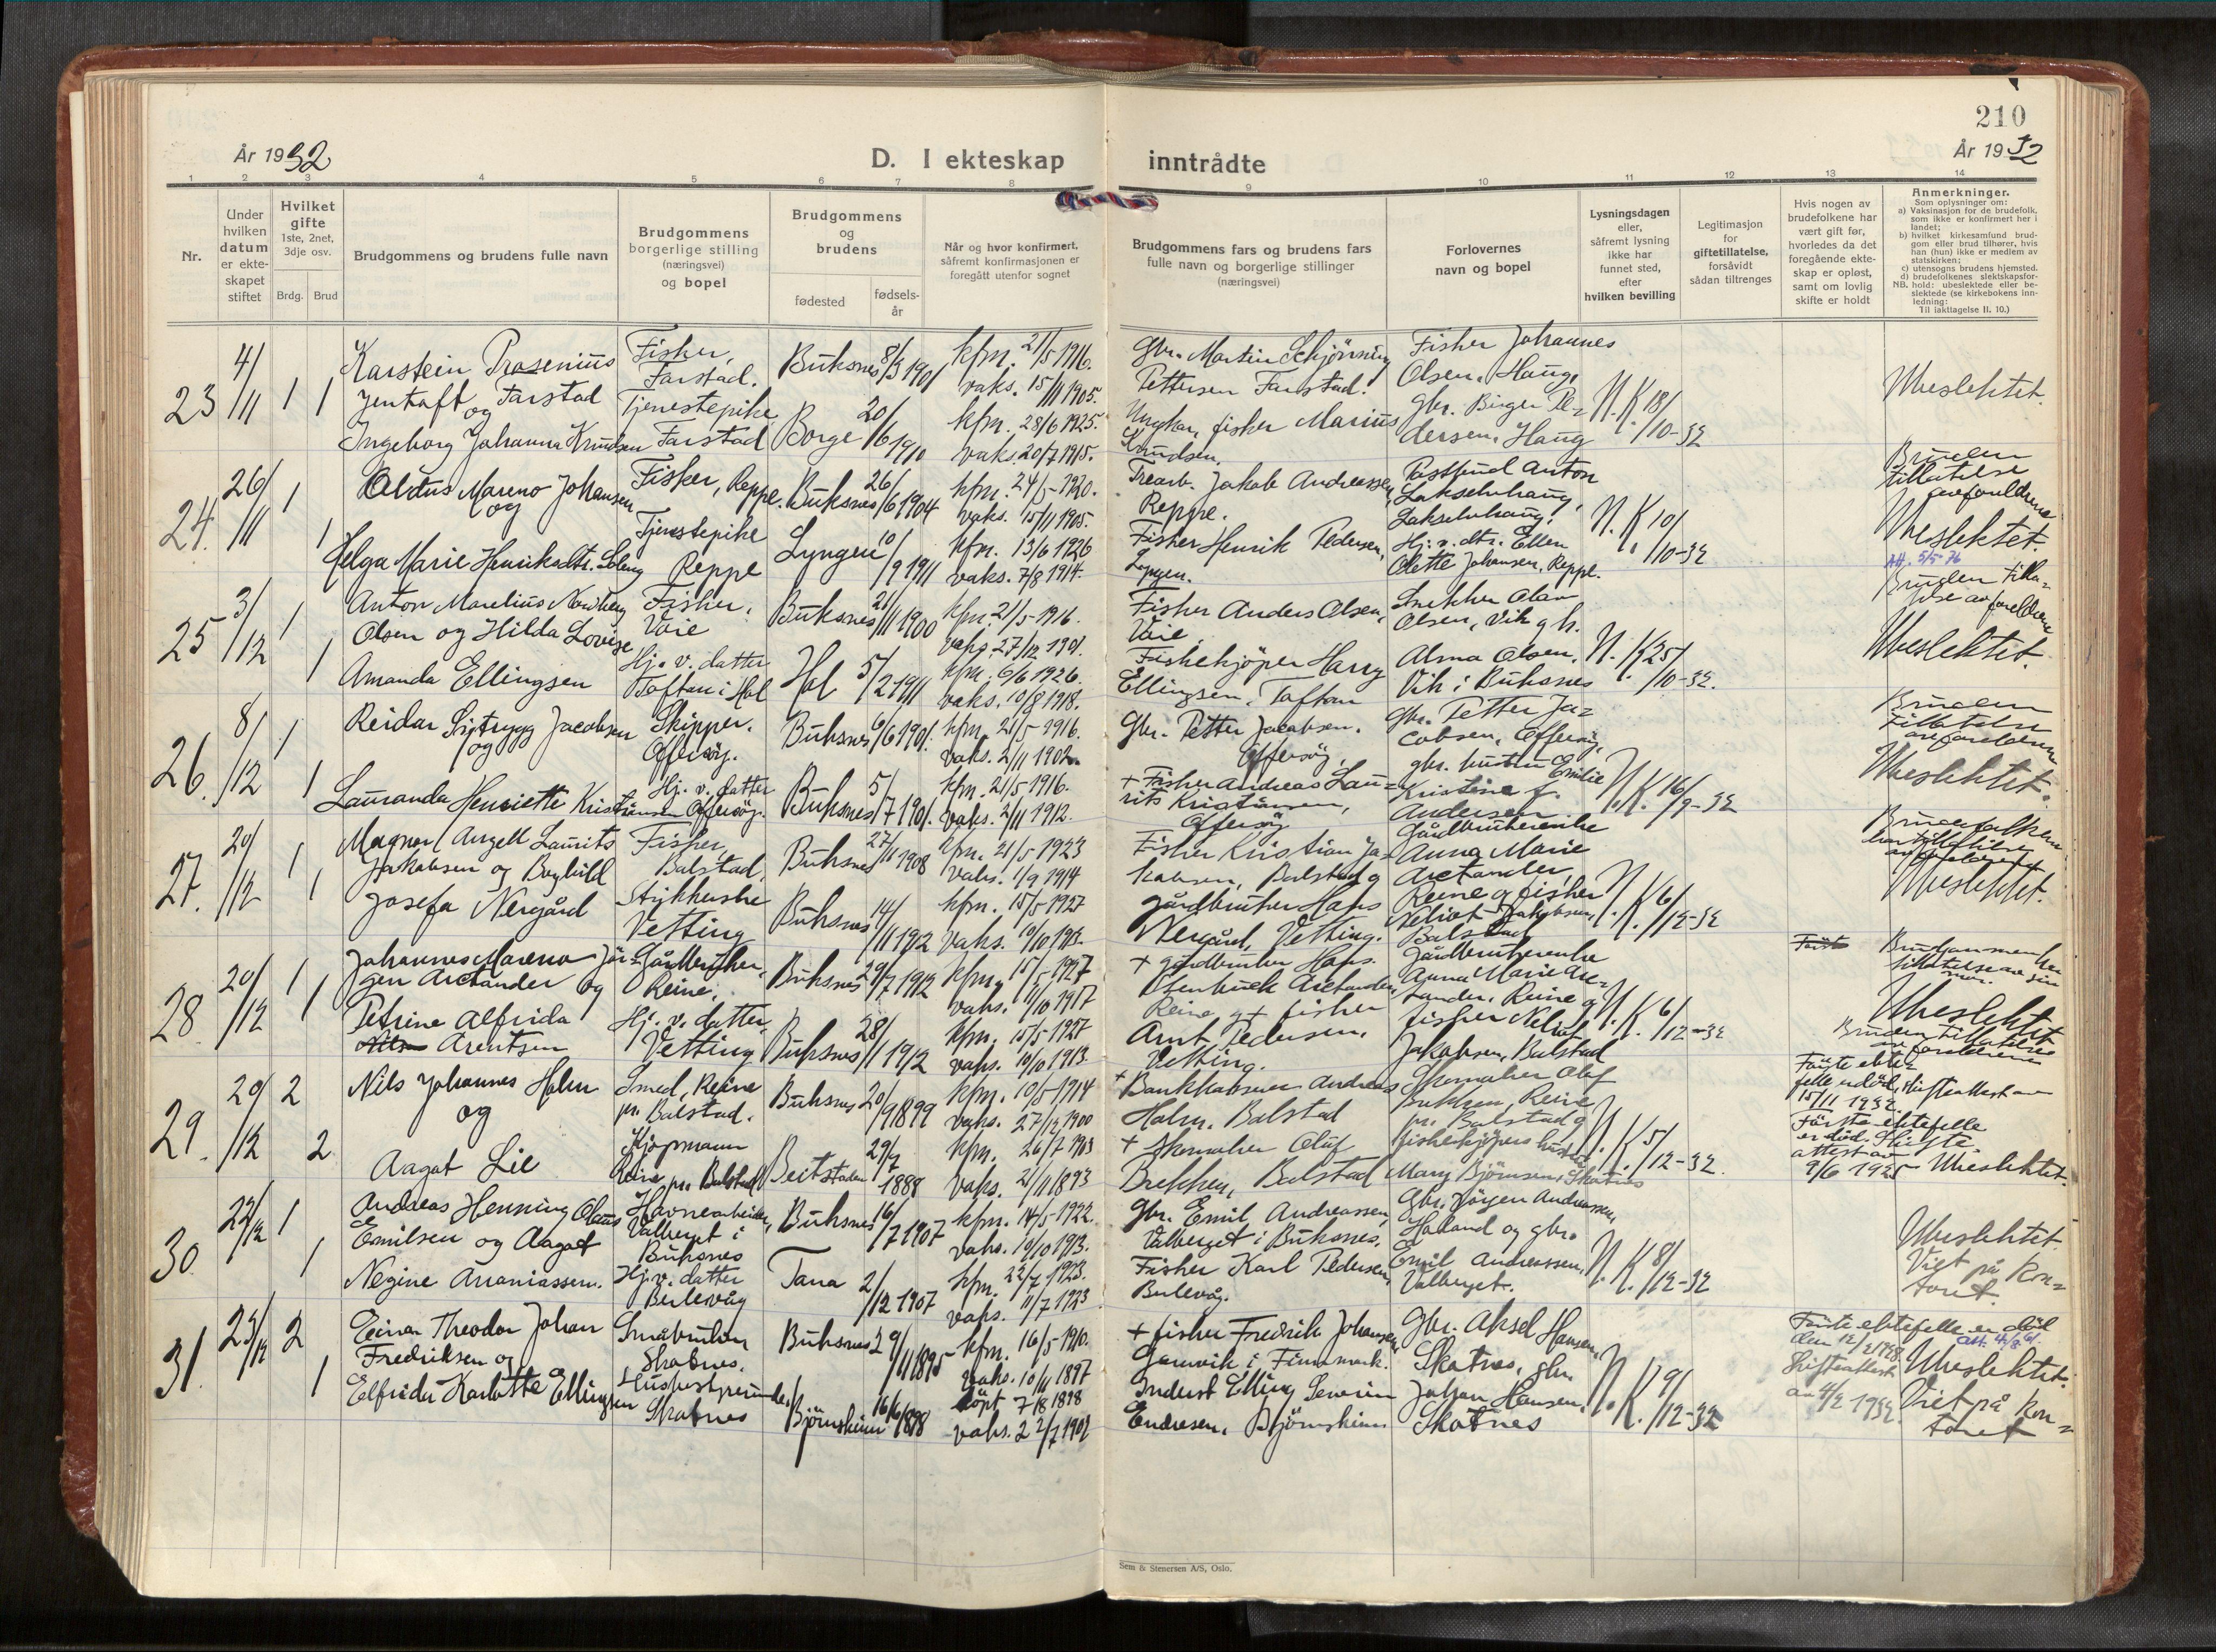 SAT, Ministerialprotokoller, klokkerbøker og fødselsregistre - Nordland, 881/L1161: Ministerialbok nr. 881A14, 1932-1955, s. 210